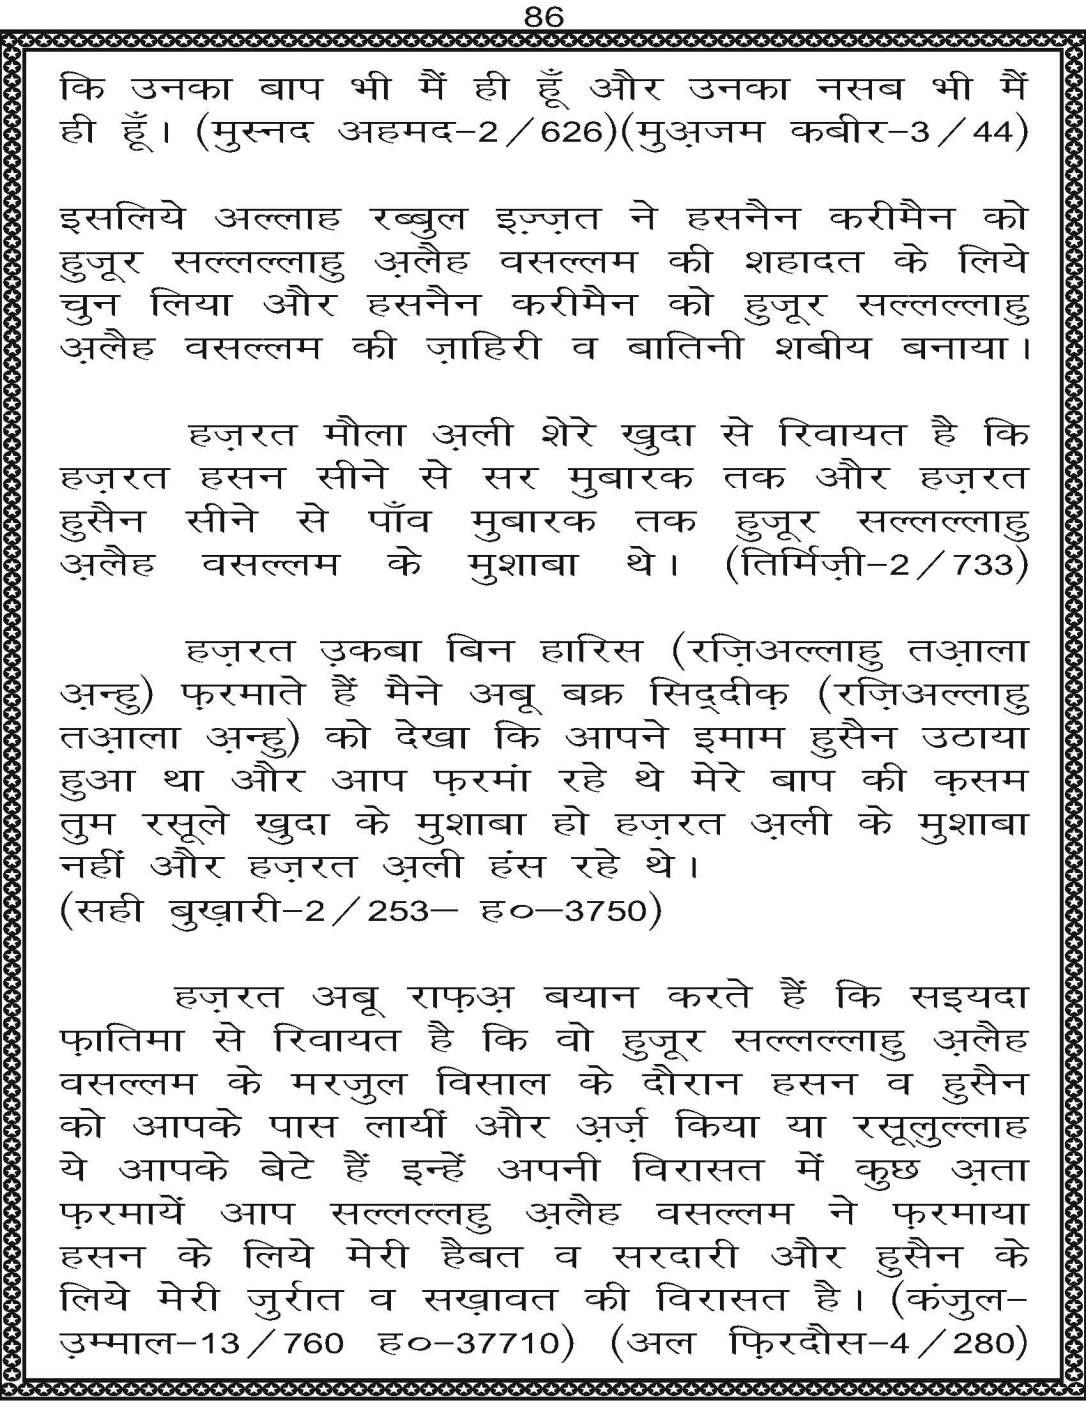 AzmateTaziyadari_Page_086